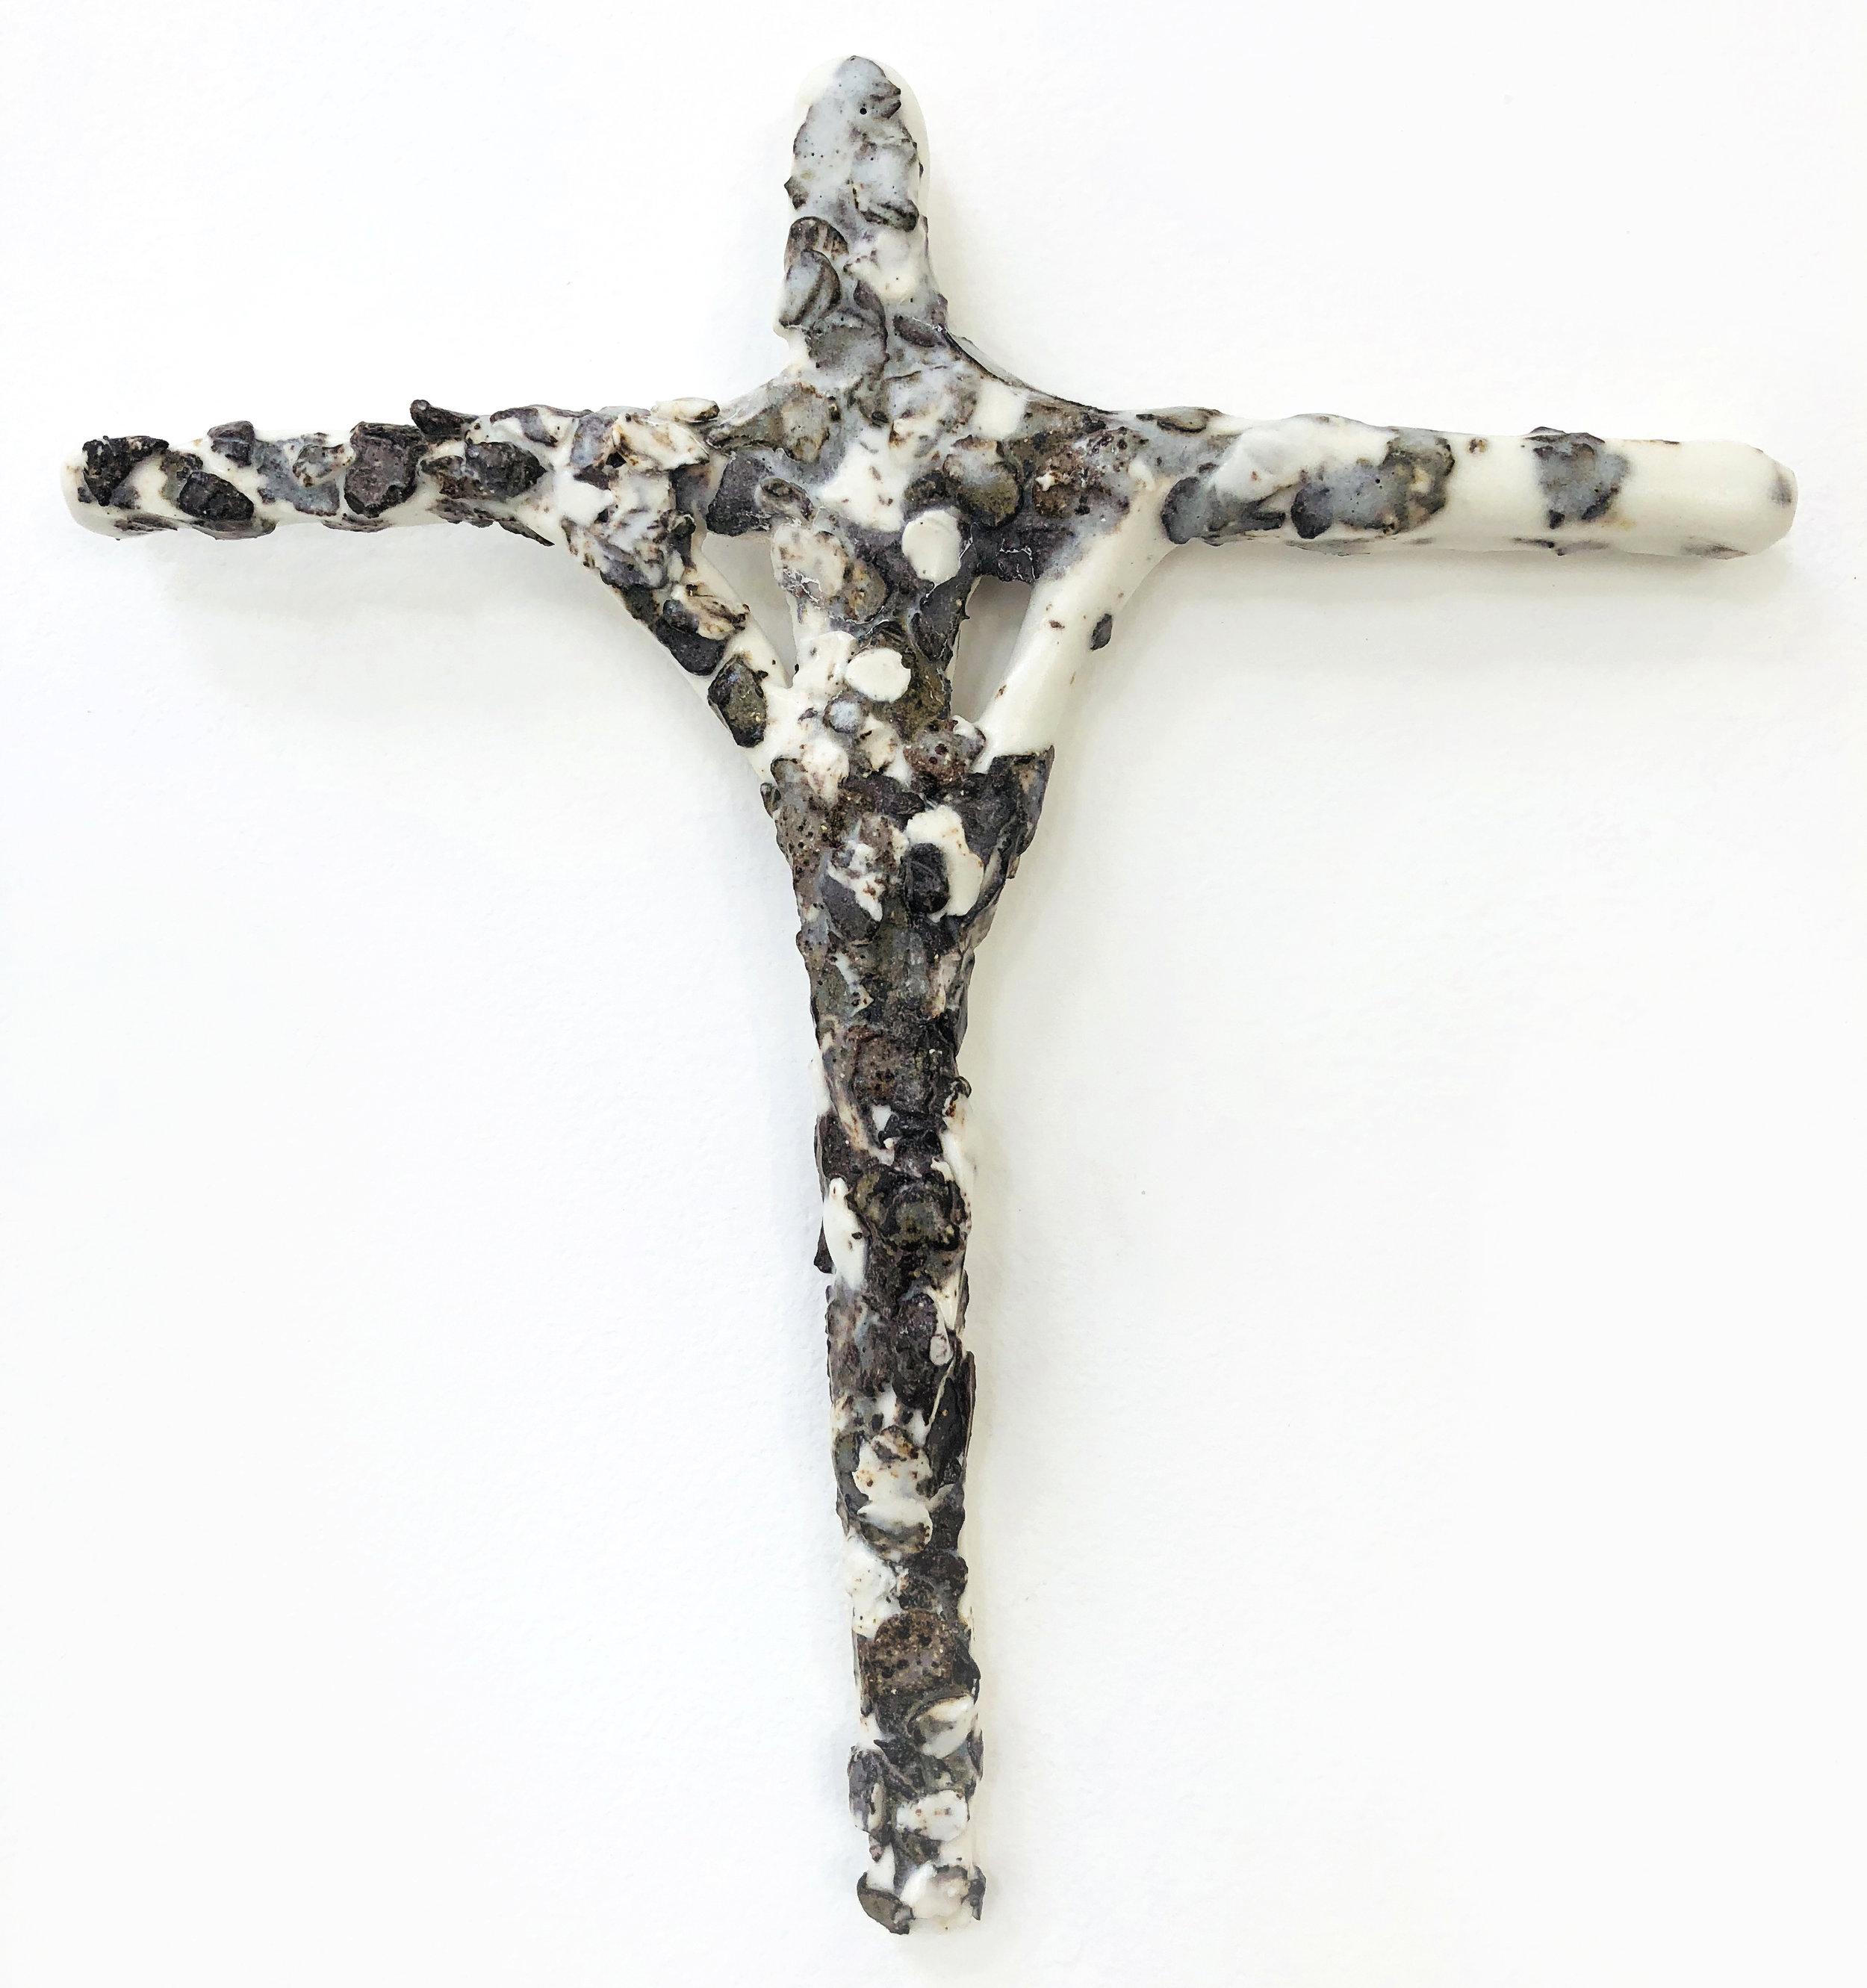 26-260x240-$1500-RichardLewer-Crucifix.jpg